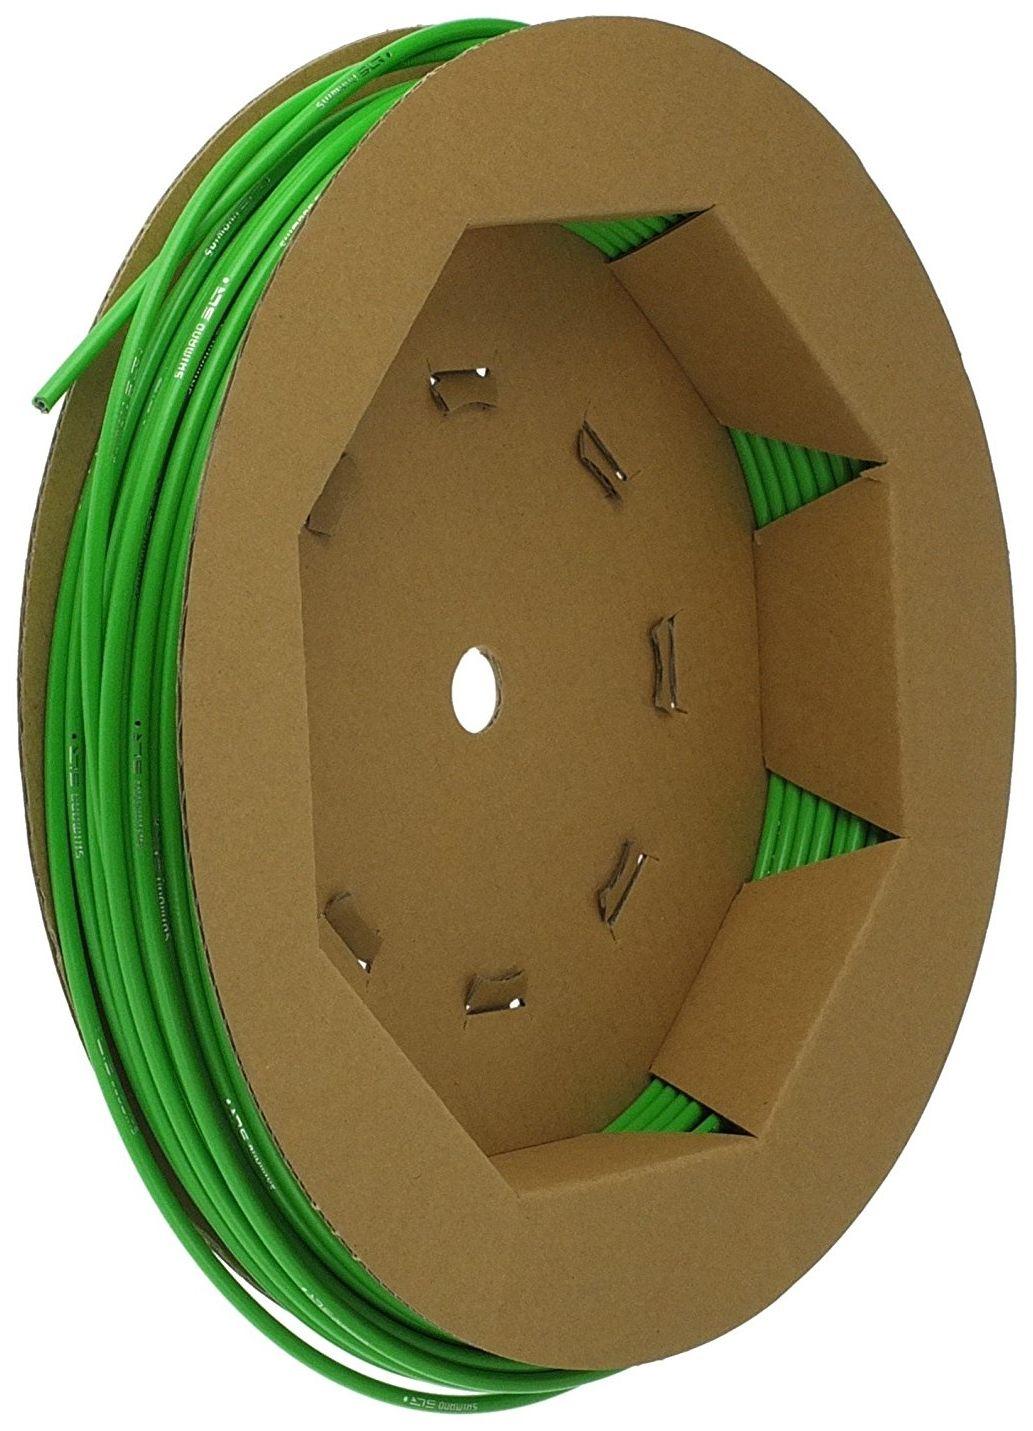 Запчасть Shimano оплетка троса тормоза SLR (Y80900019) оплетка тормоза shimano slr 40м в коробке цвет желтый y80900018